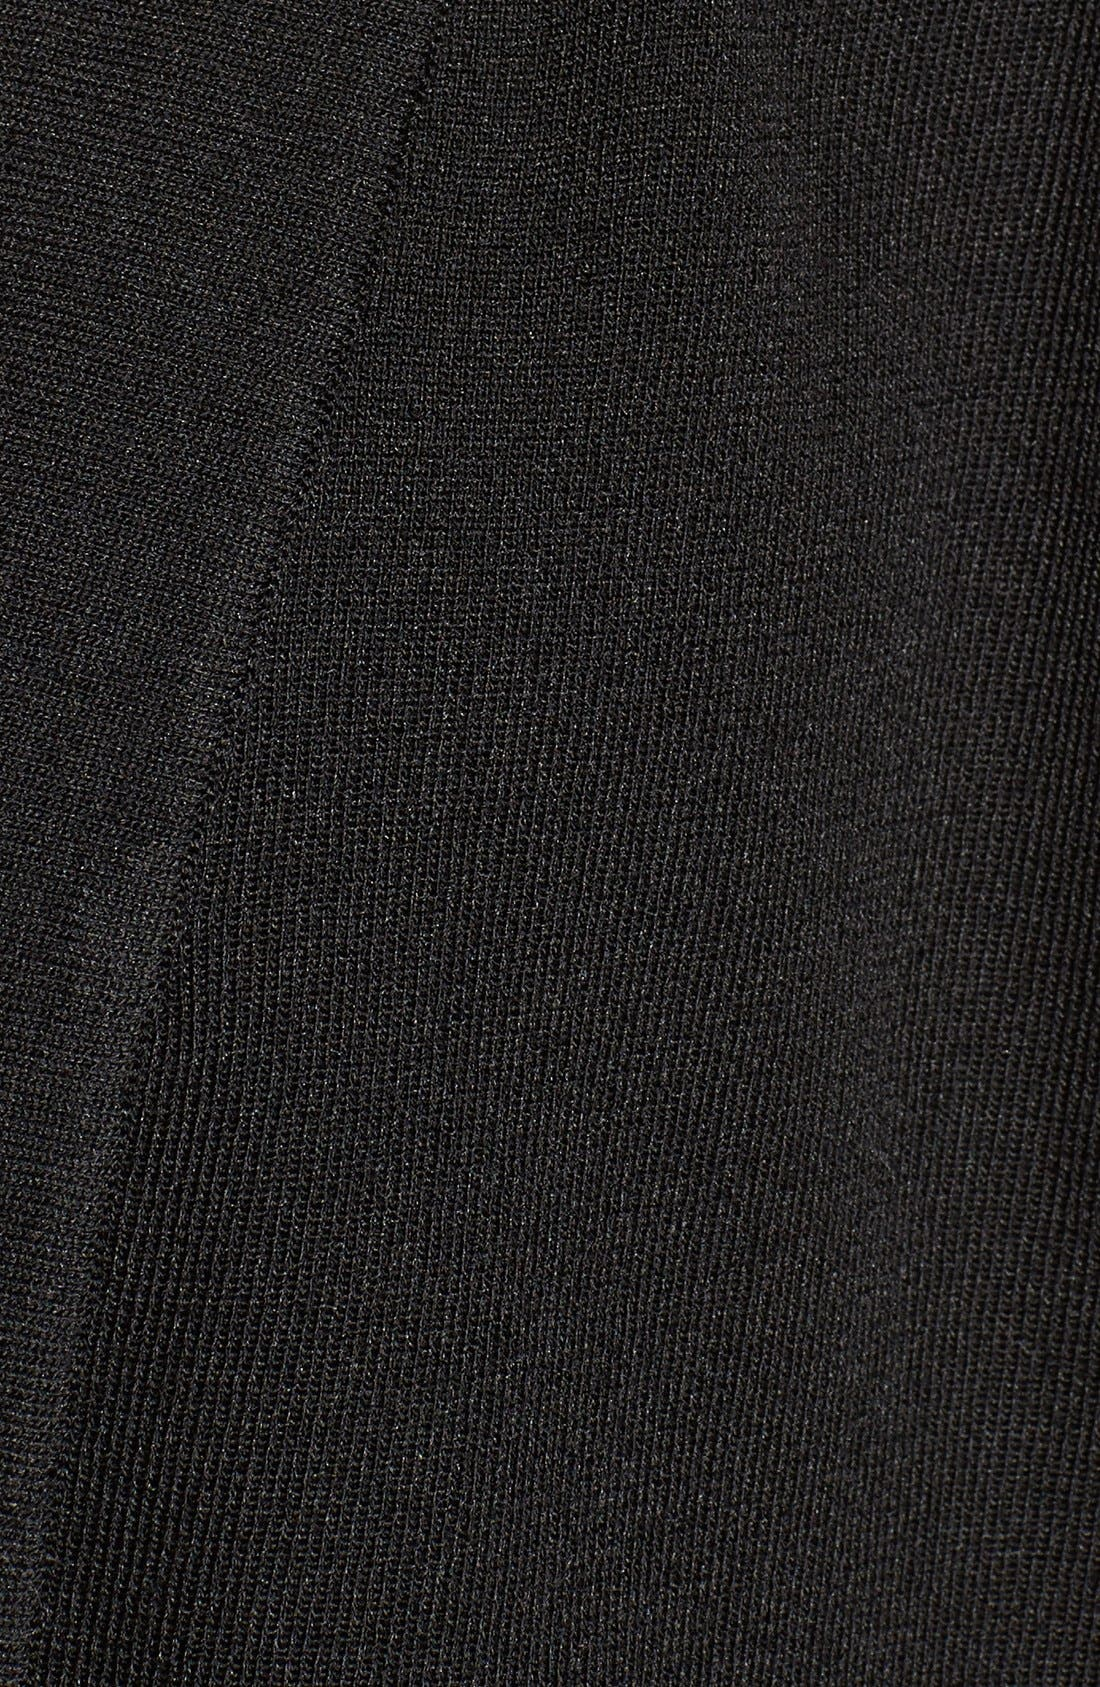 Patch Pocket Cardigan,                             Alternate thumbnail 5, color,                             BLACK